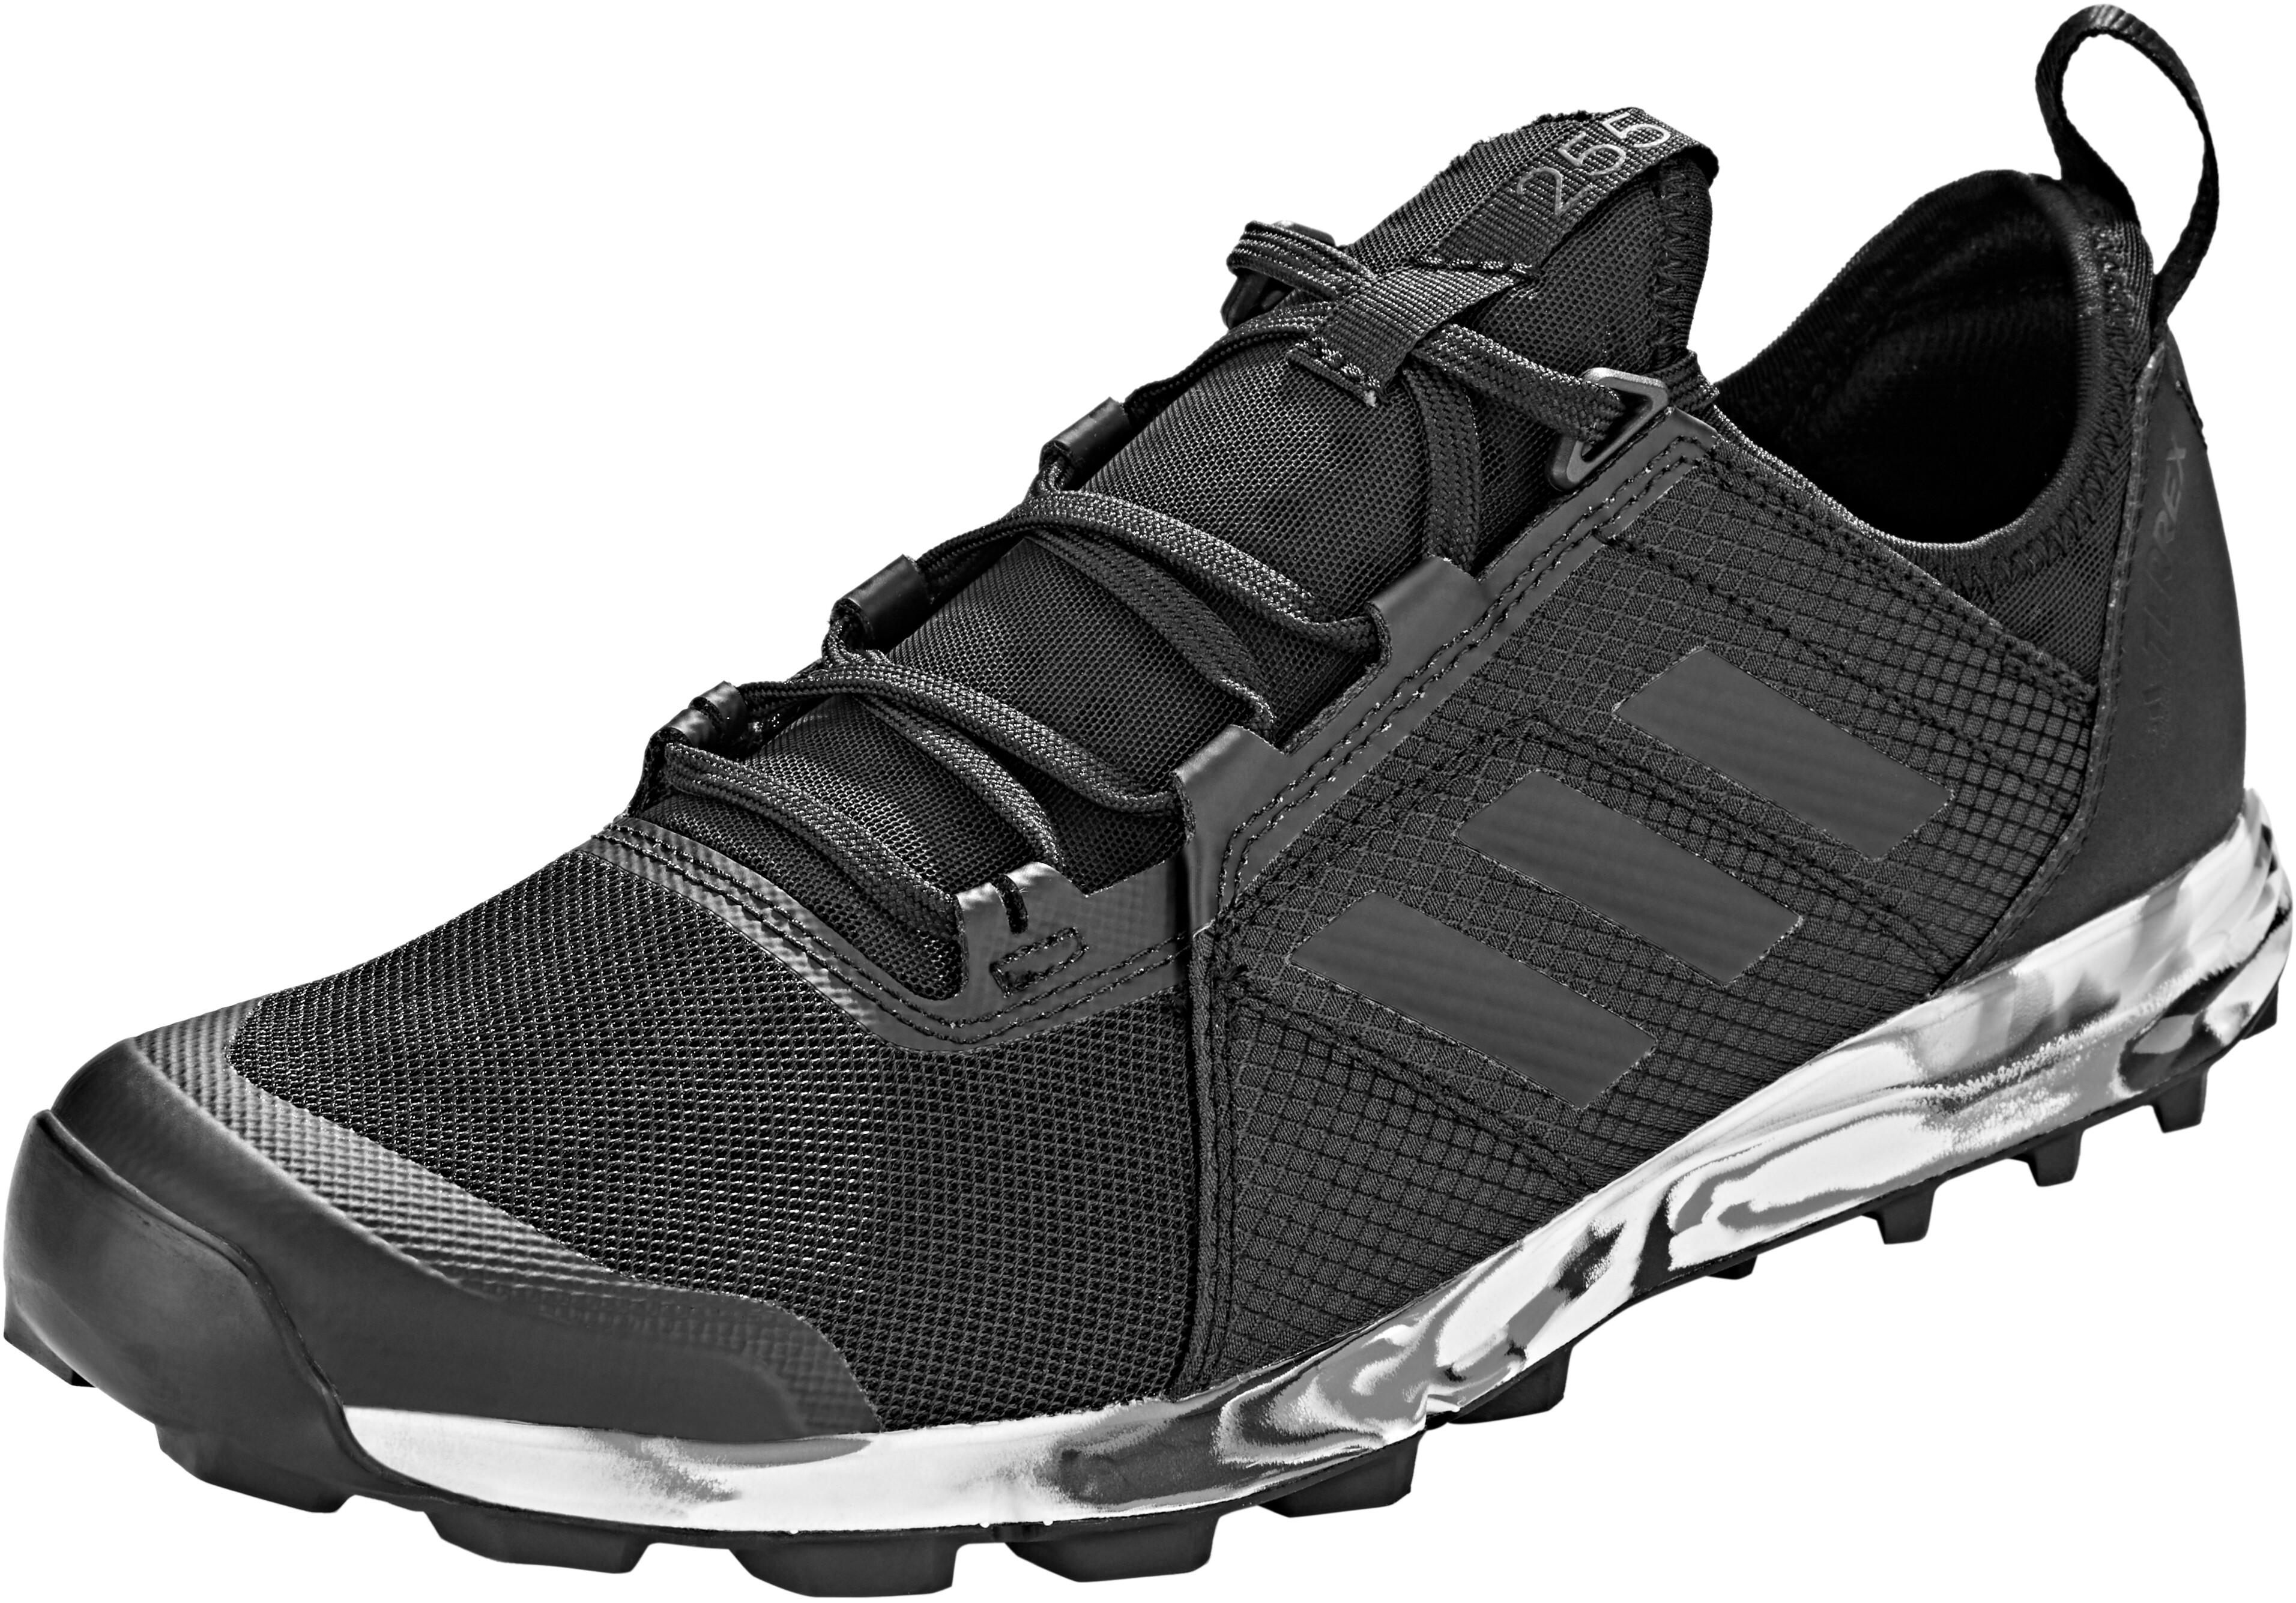 Increíble eficientemente atraer  adidas TERREX Agravic Speed Shoes Men core black/core black/core ...